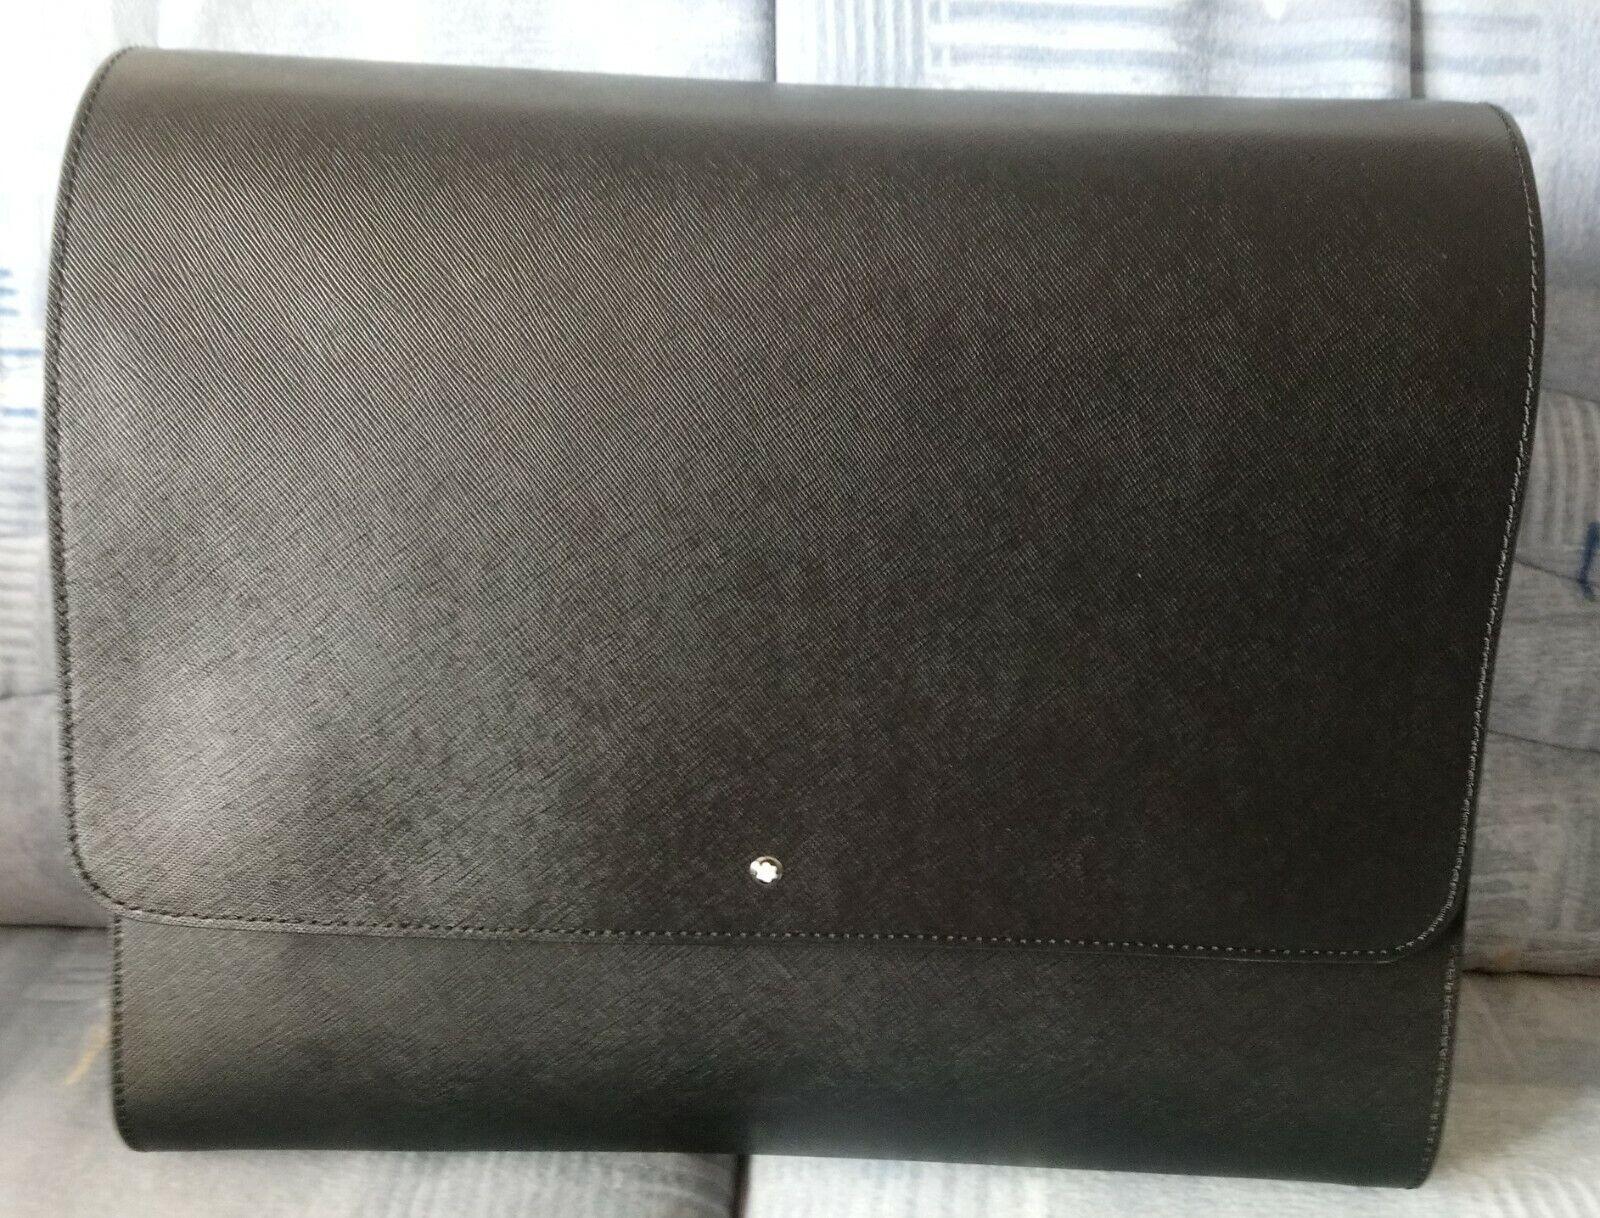 * NEW * BOXED MONTBLANC 35x26x10 College Binder Sartorial Messenger Bag Leather Bag